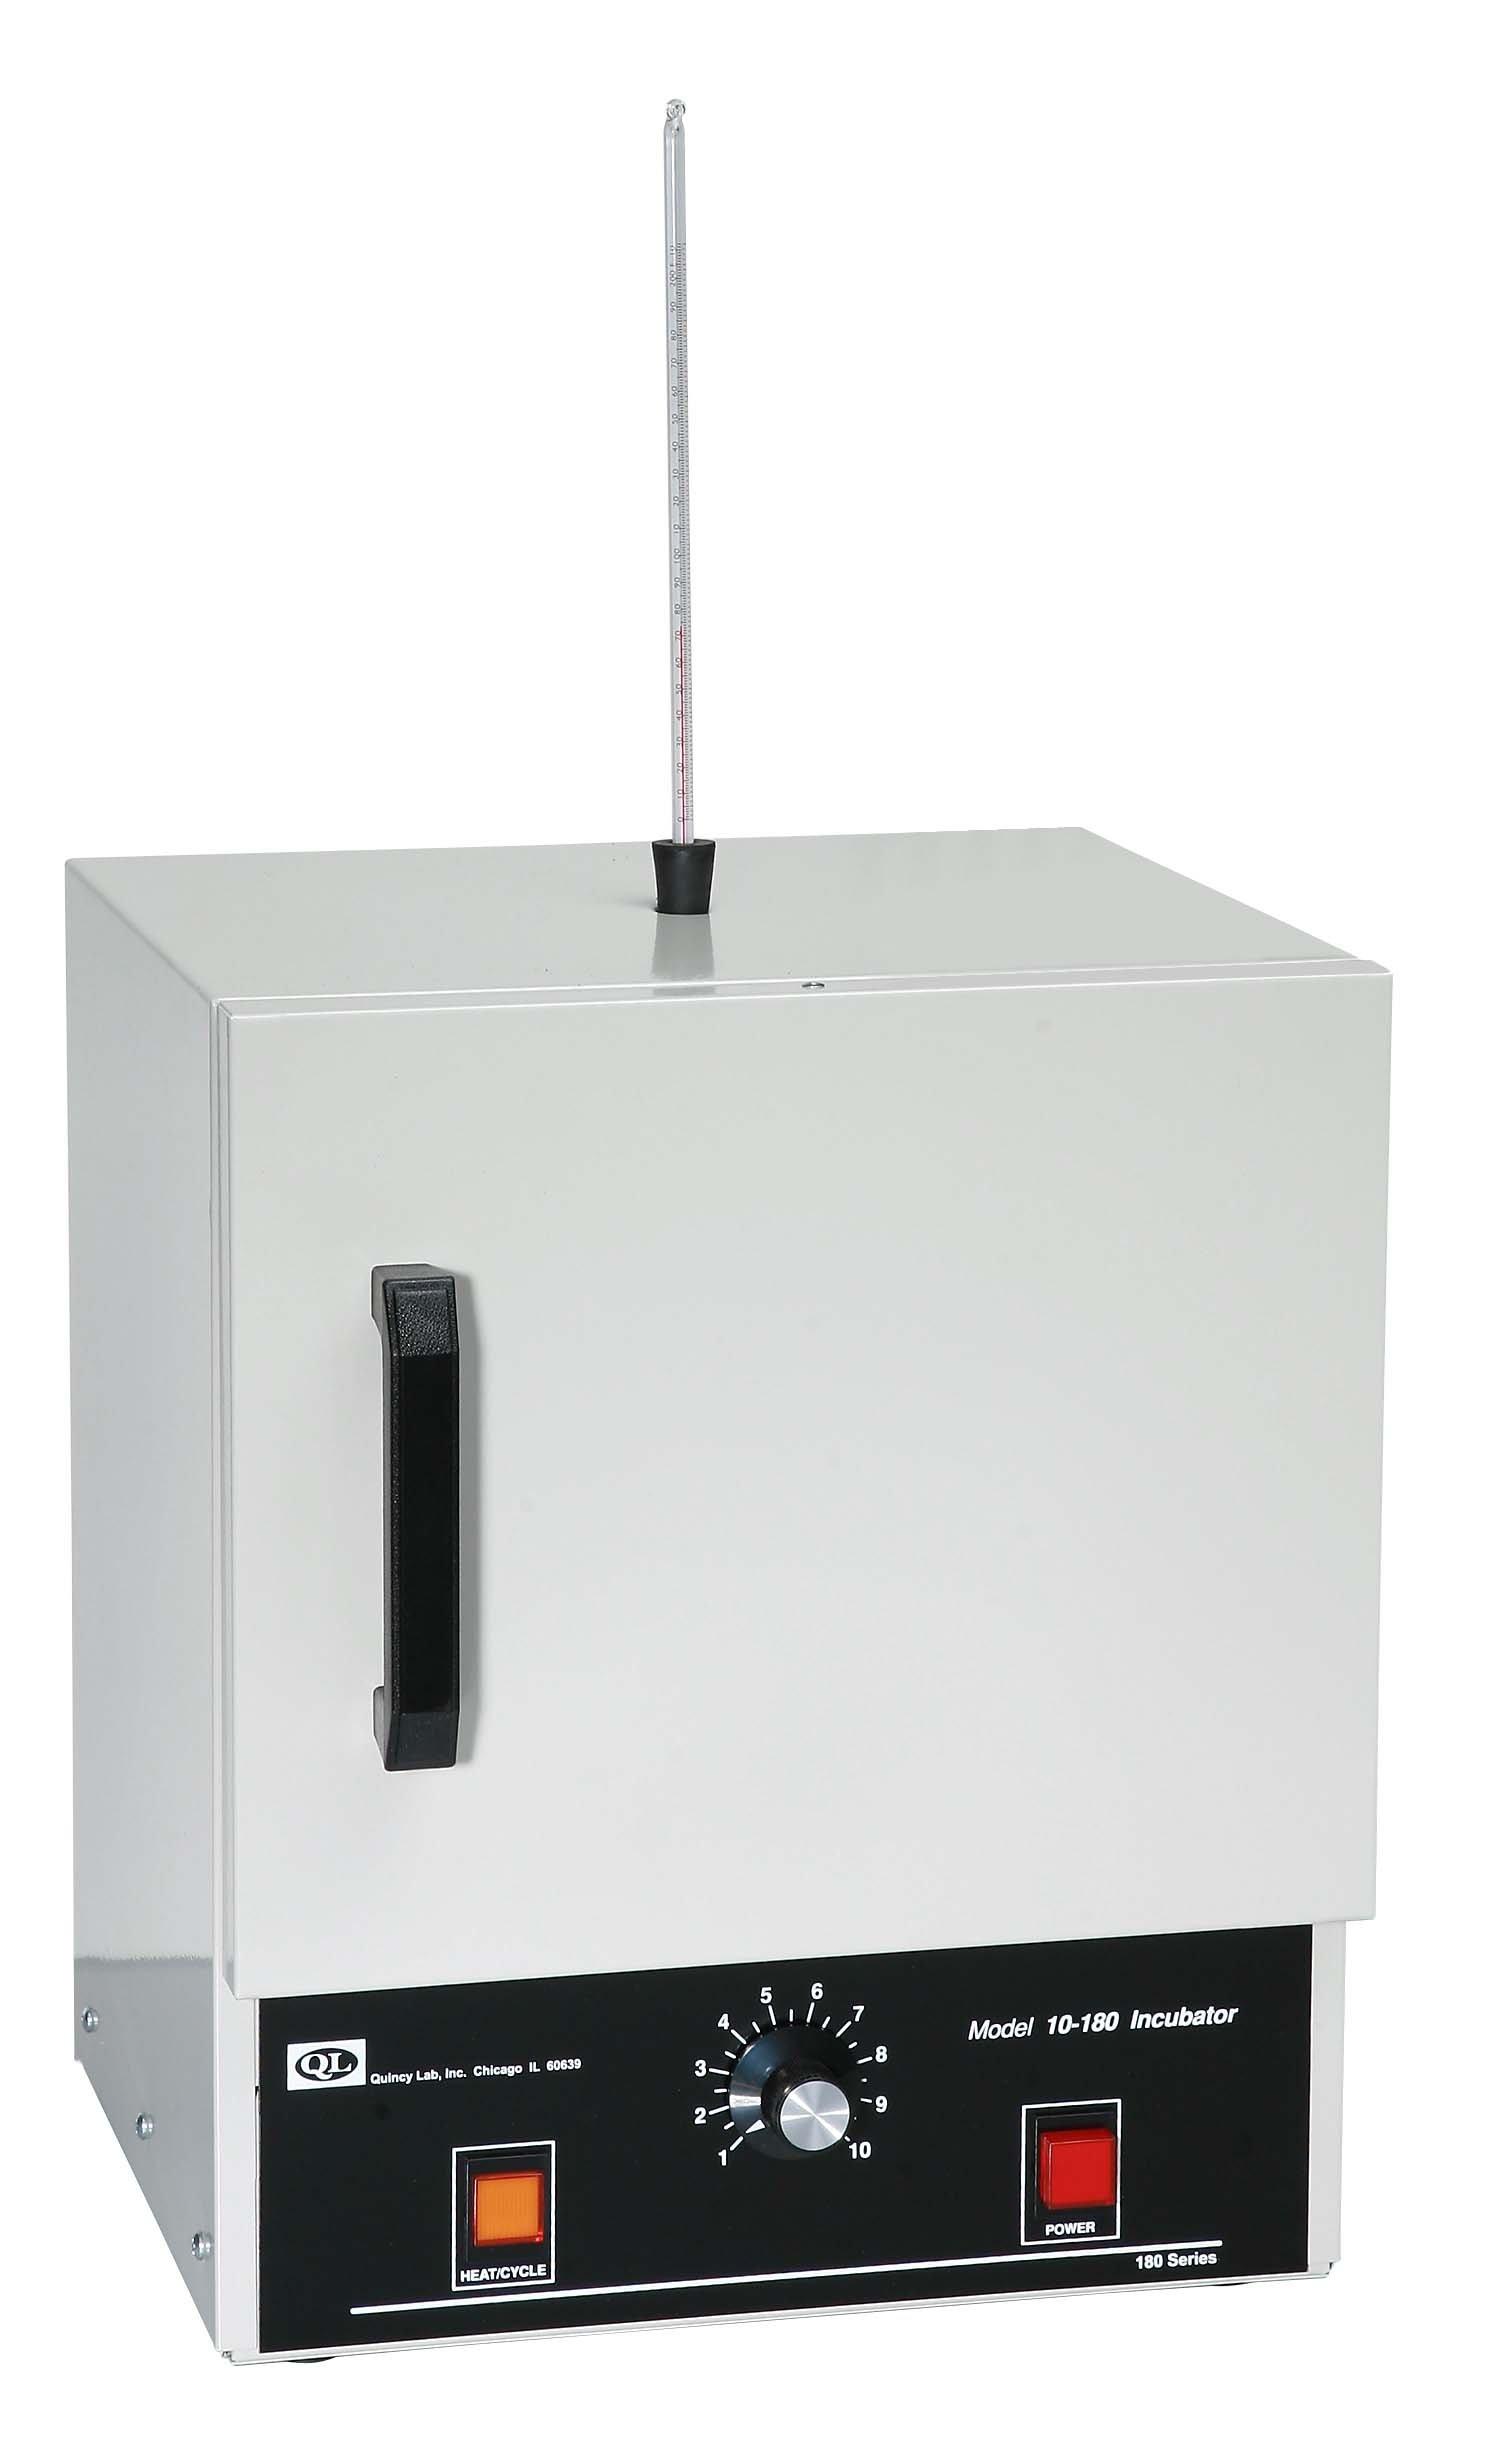 Quincy Lab 10-180 Aluminum/Steel Door Analog Incubator, 0.7 Cubic feet, 115V, 270W